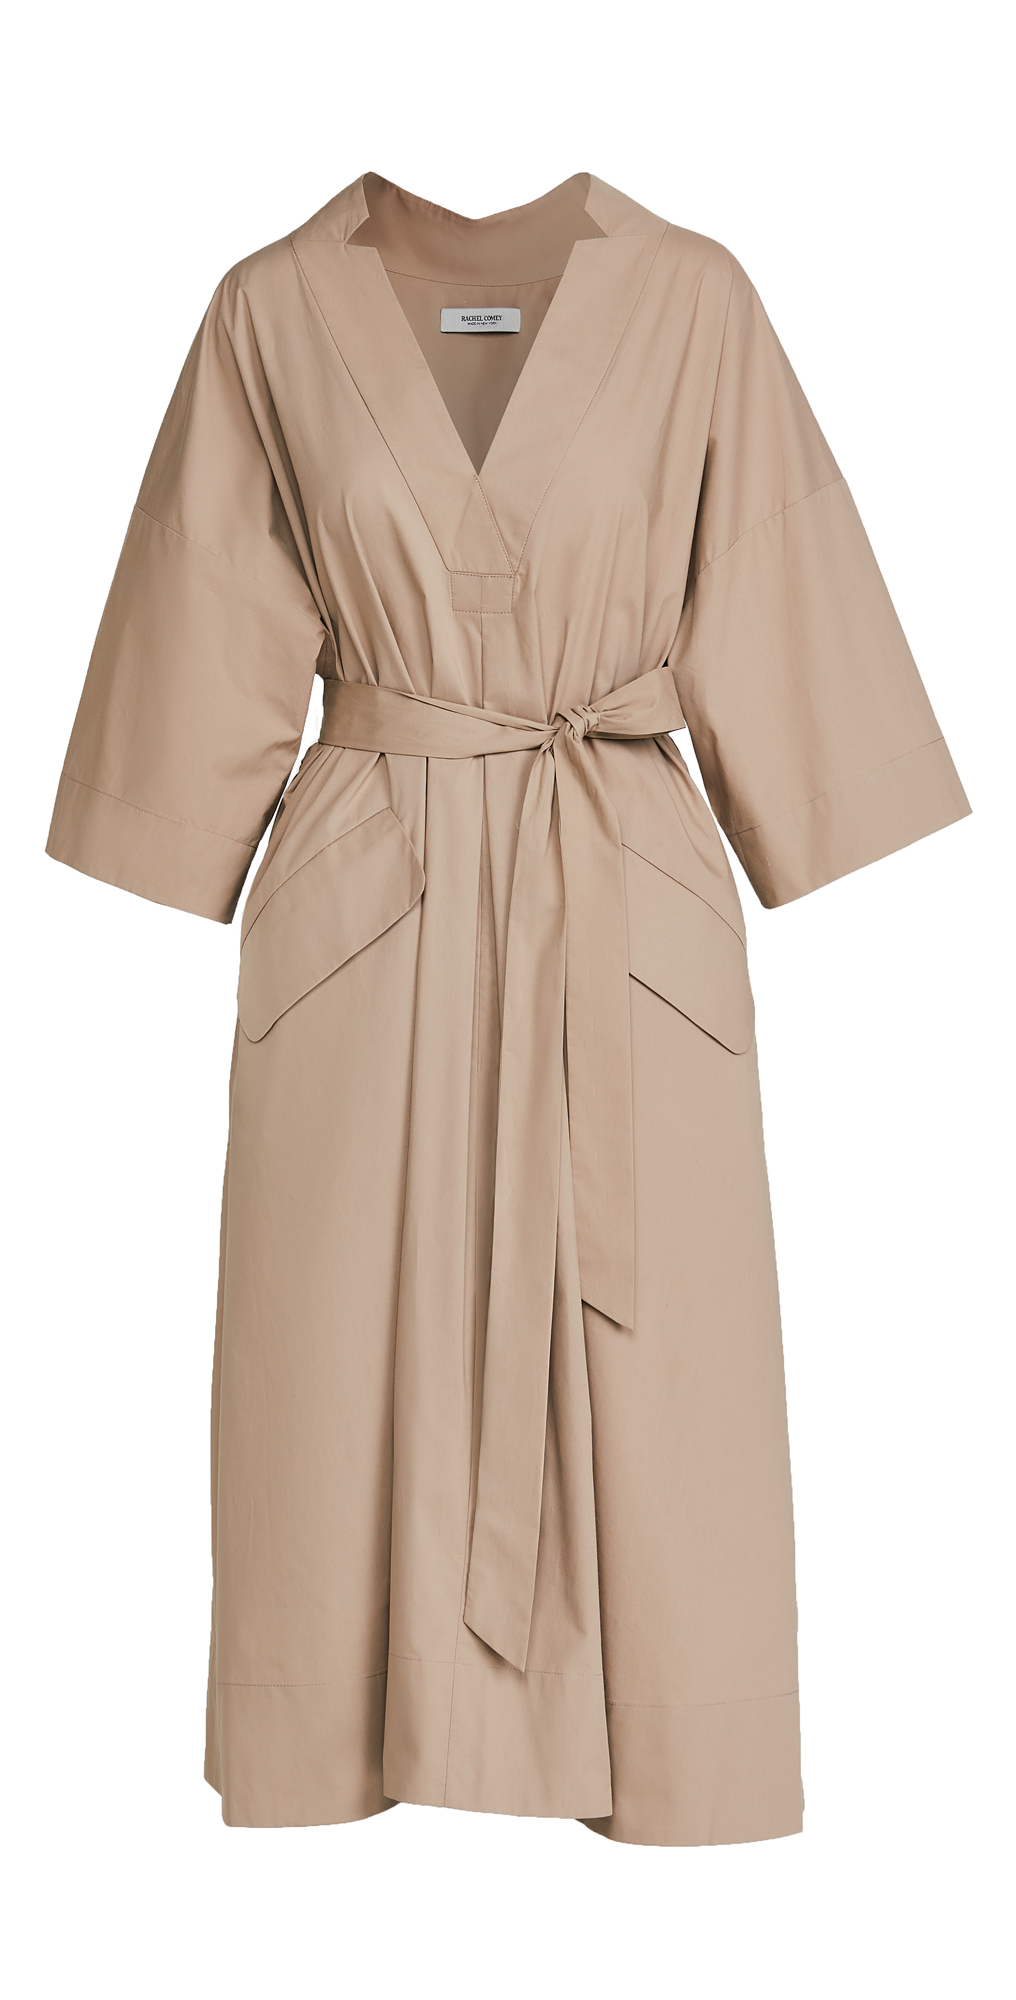 Rachel Comey Copake Dress